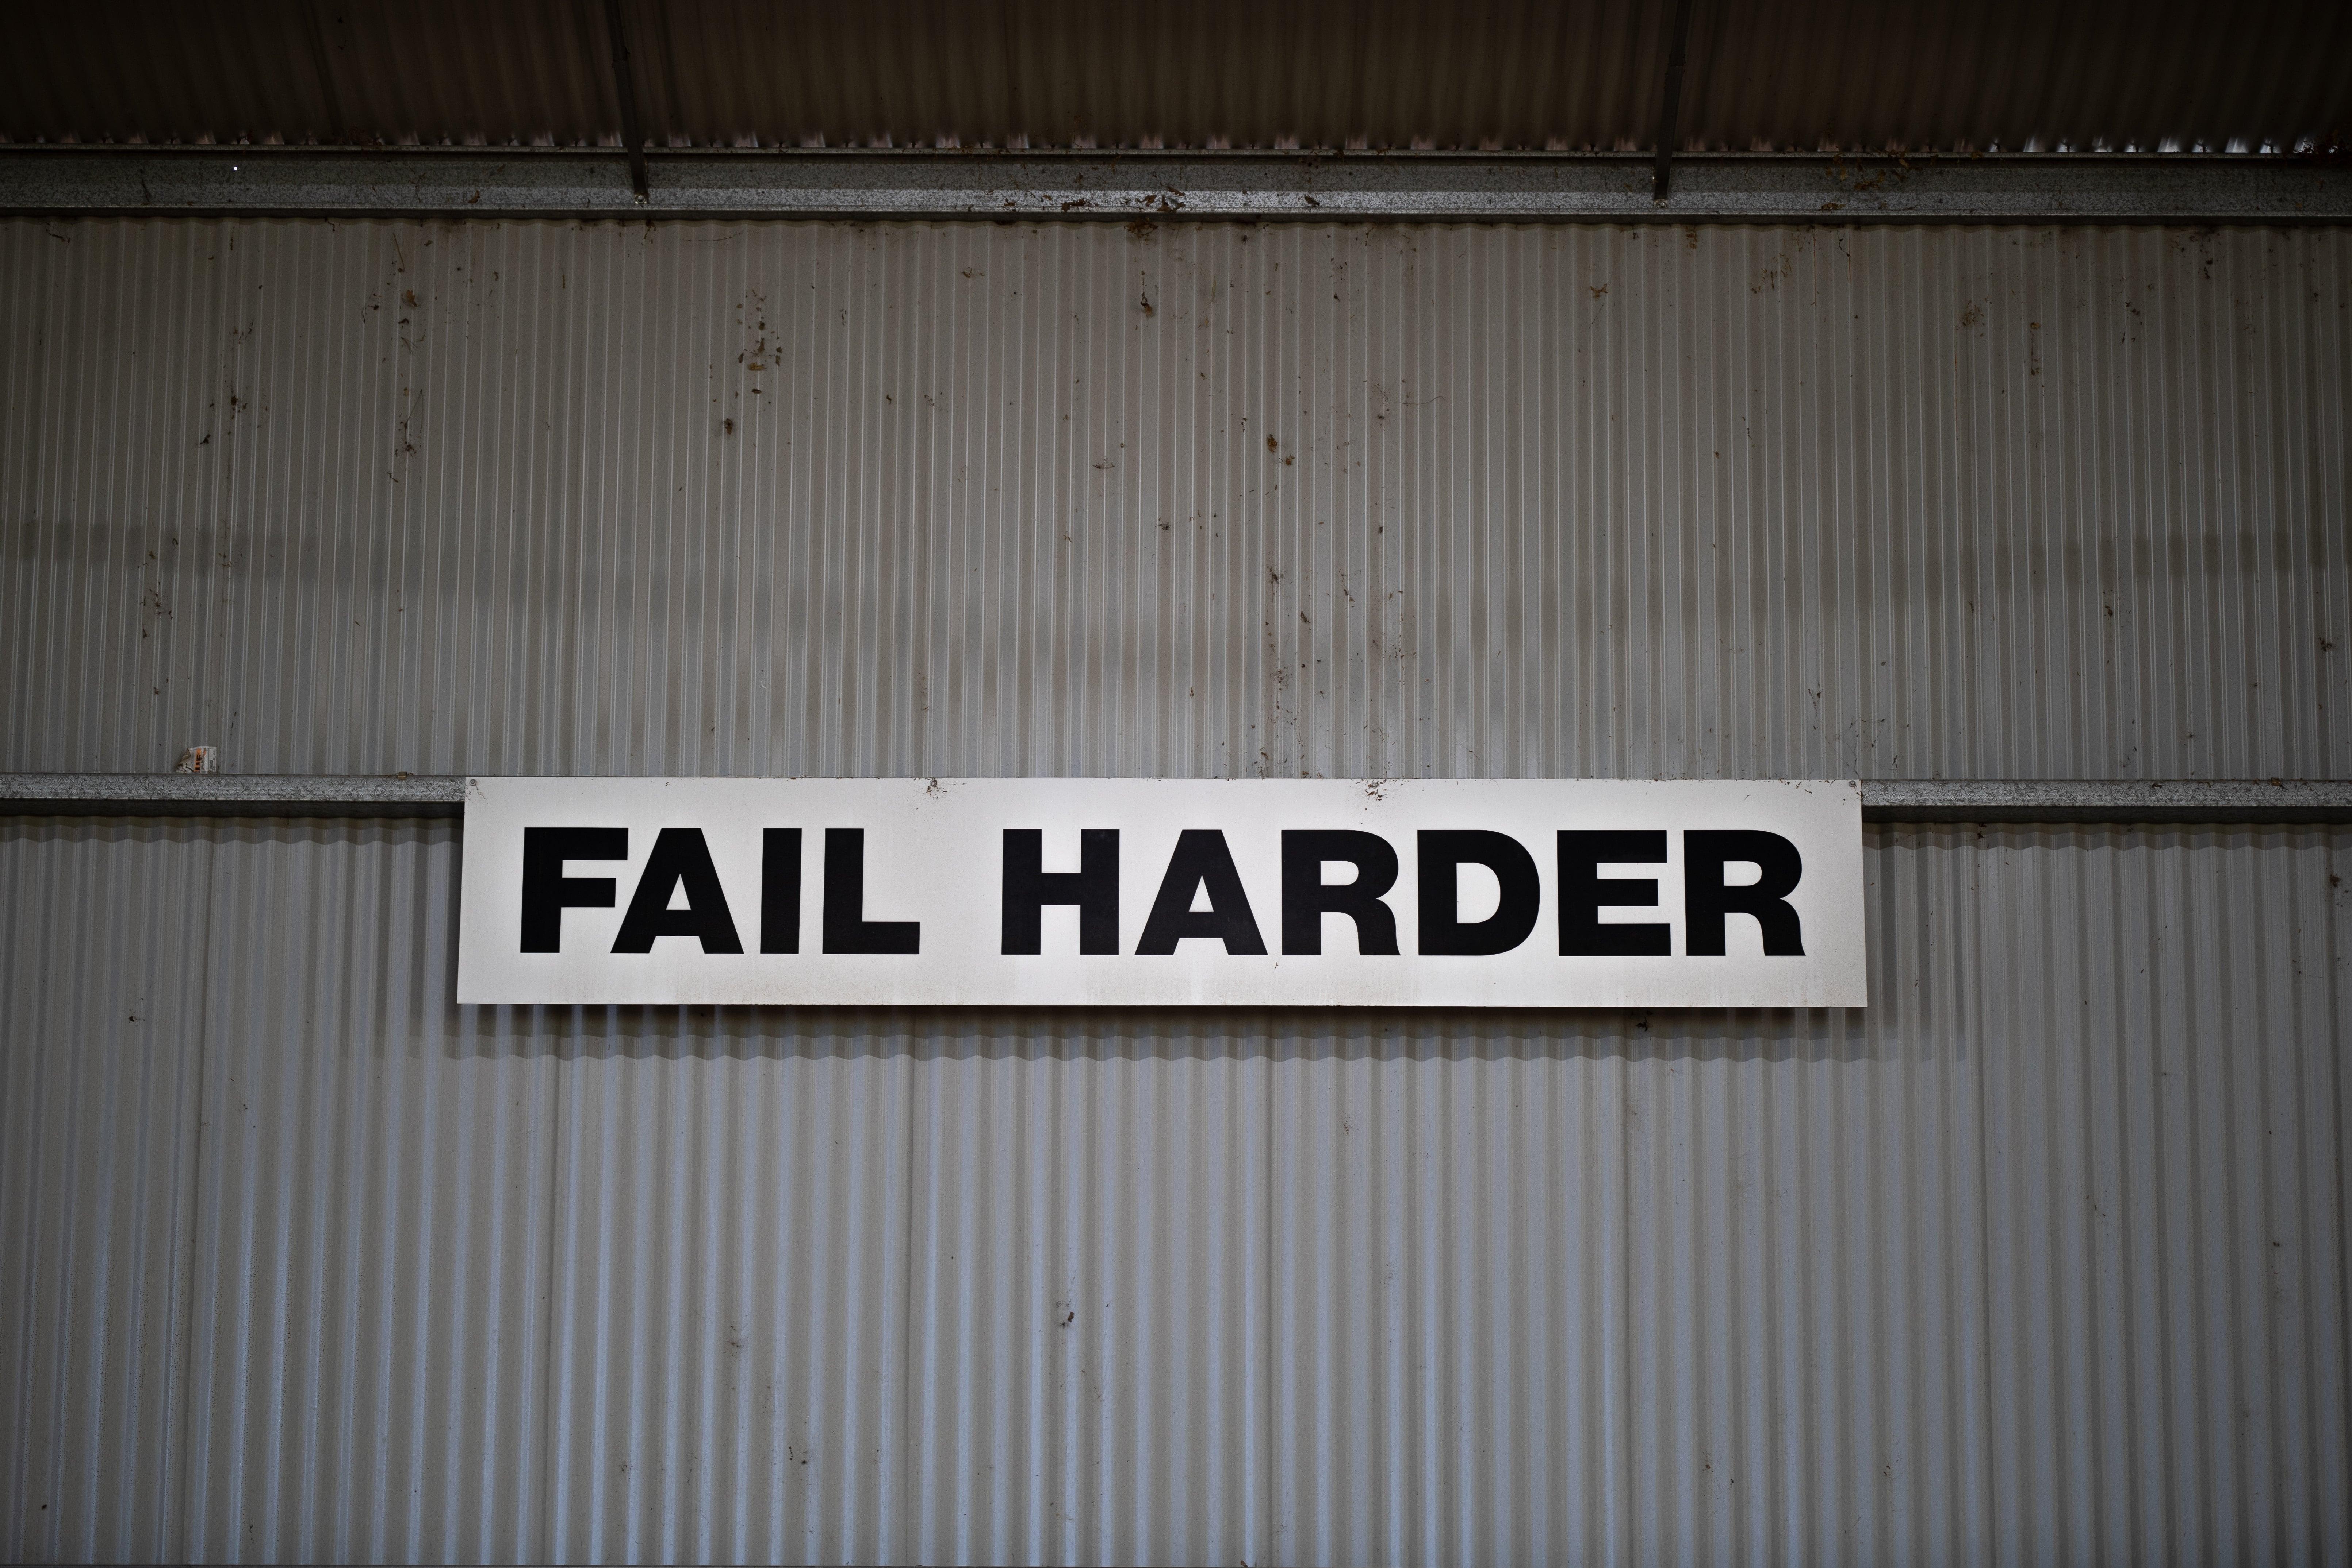 Fallimento - Fail Harder